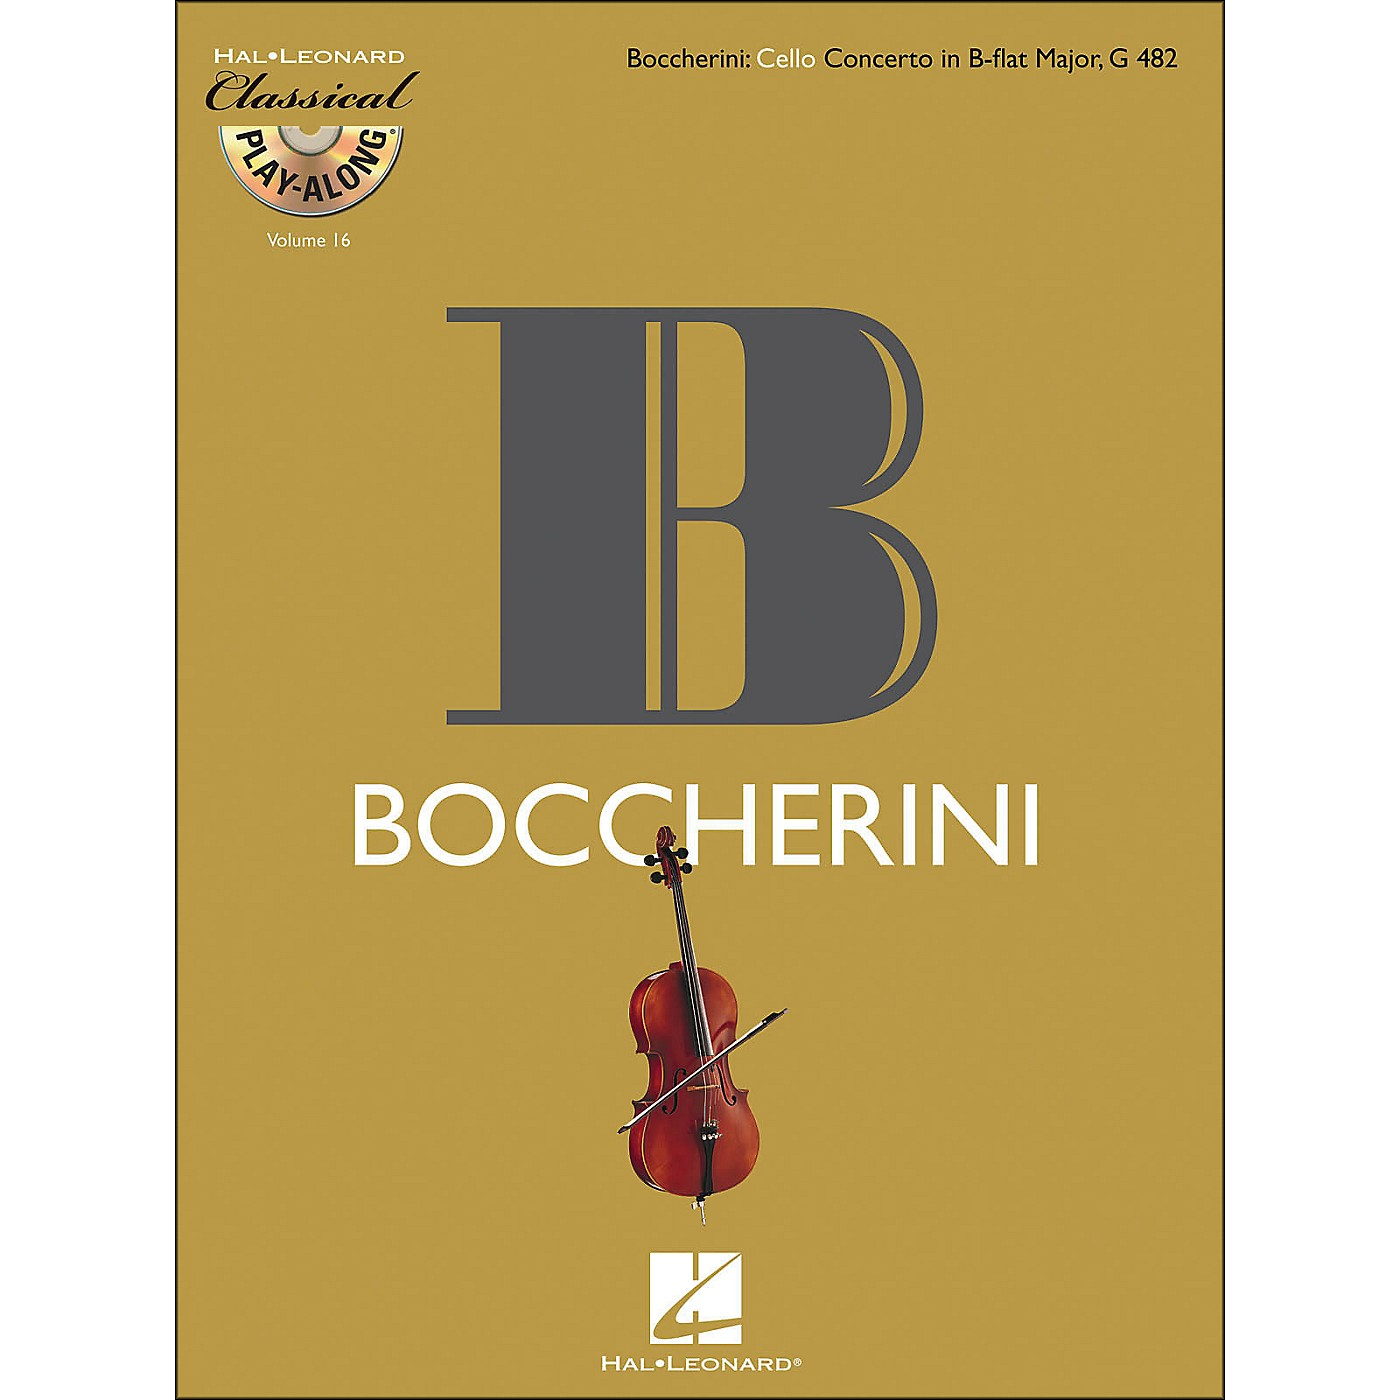 Hal Leonard Boccherini: Cello Concerto Inb-Flat Major, G 482 Classicalplay-Along 9Book/CD) Vol.16 thumbnail